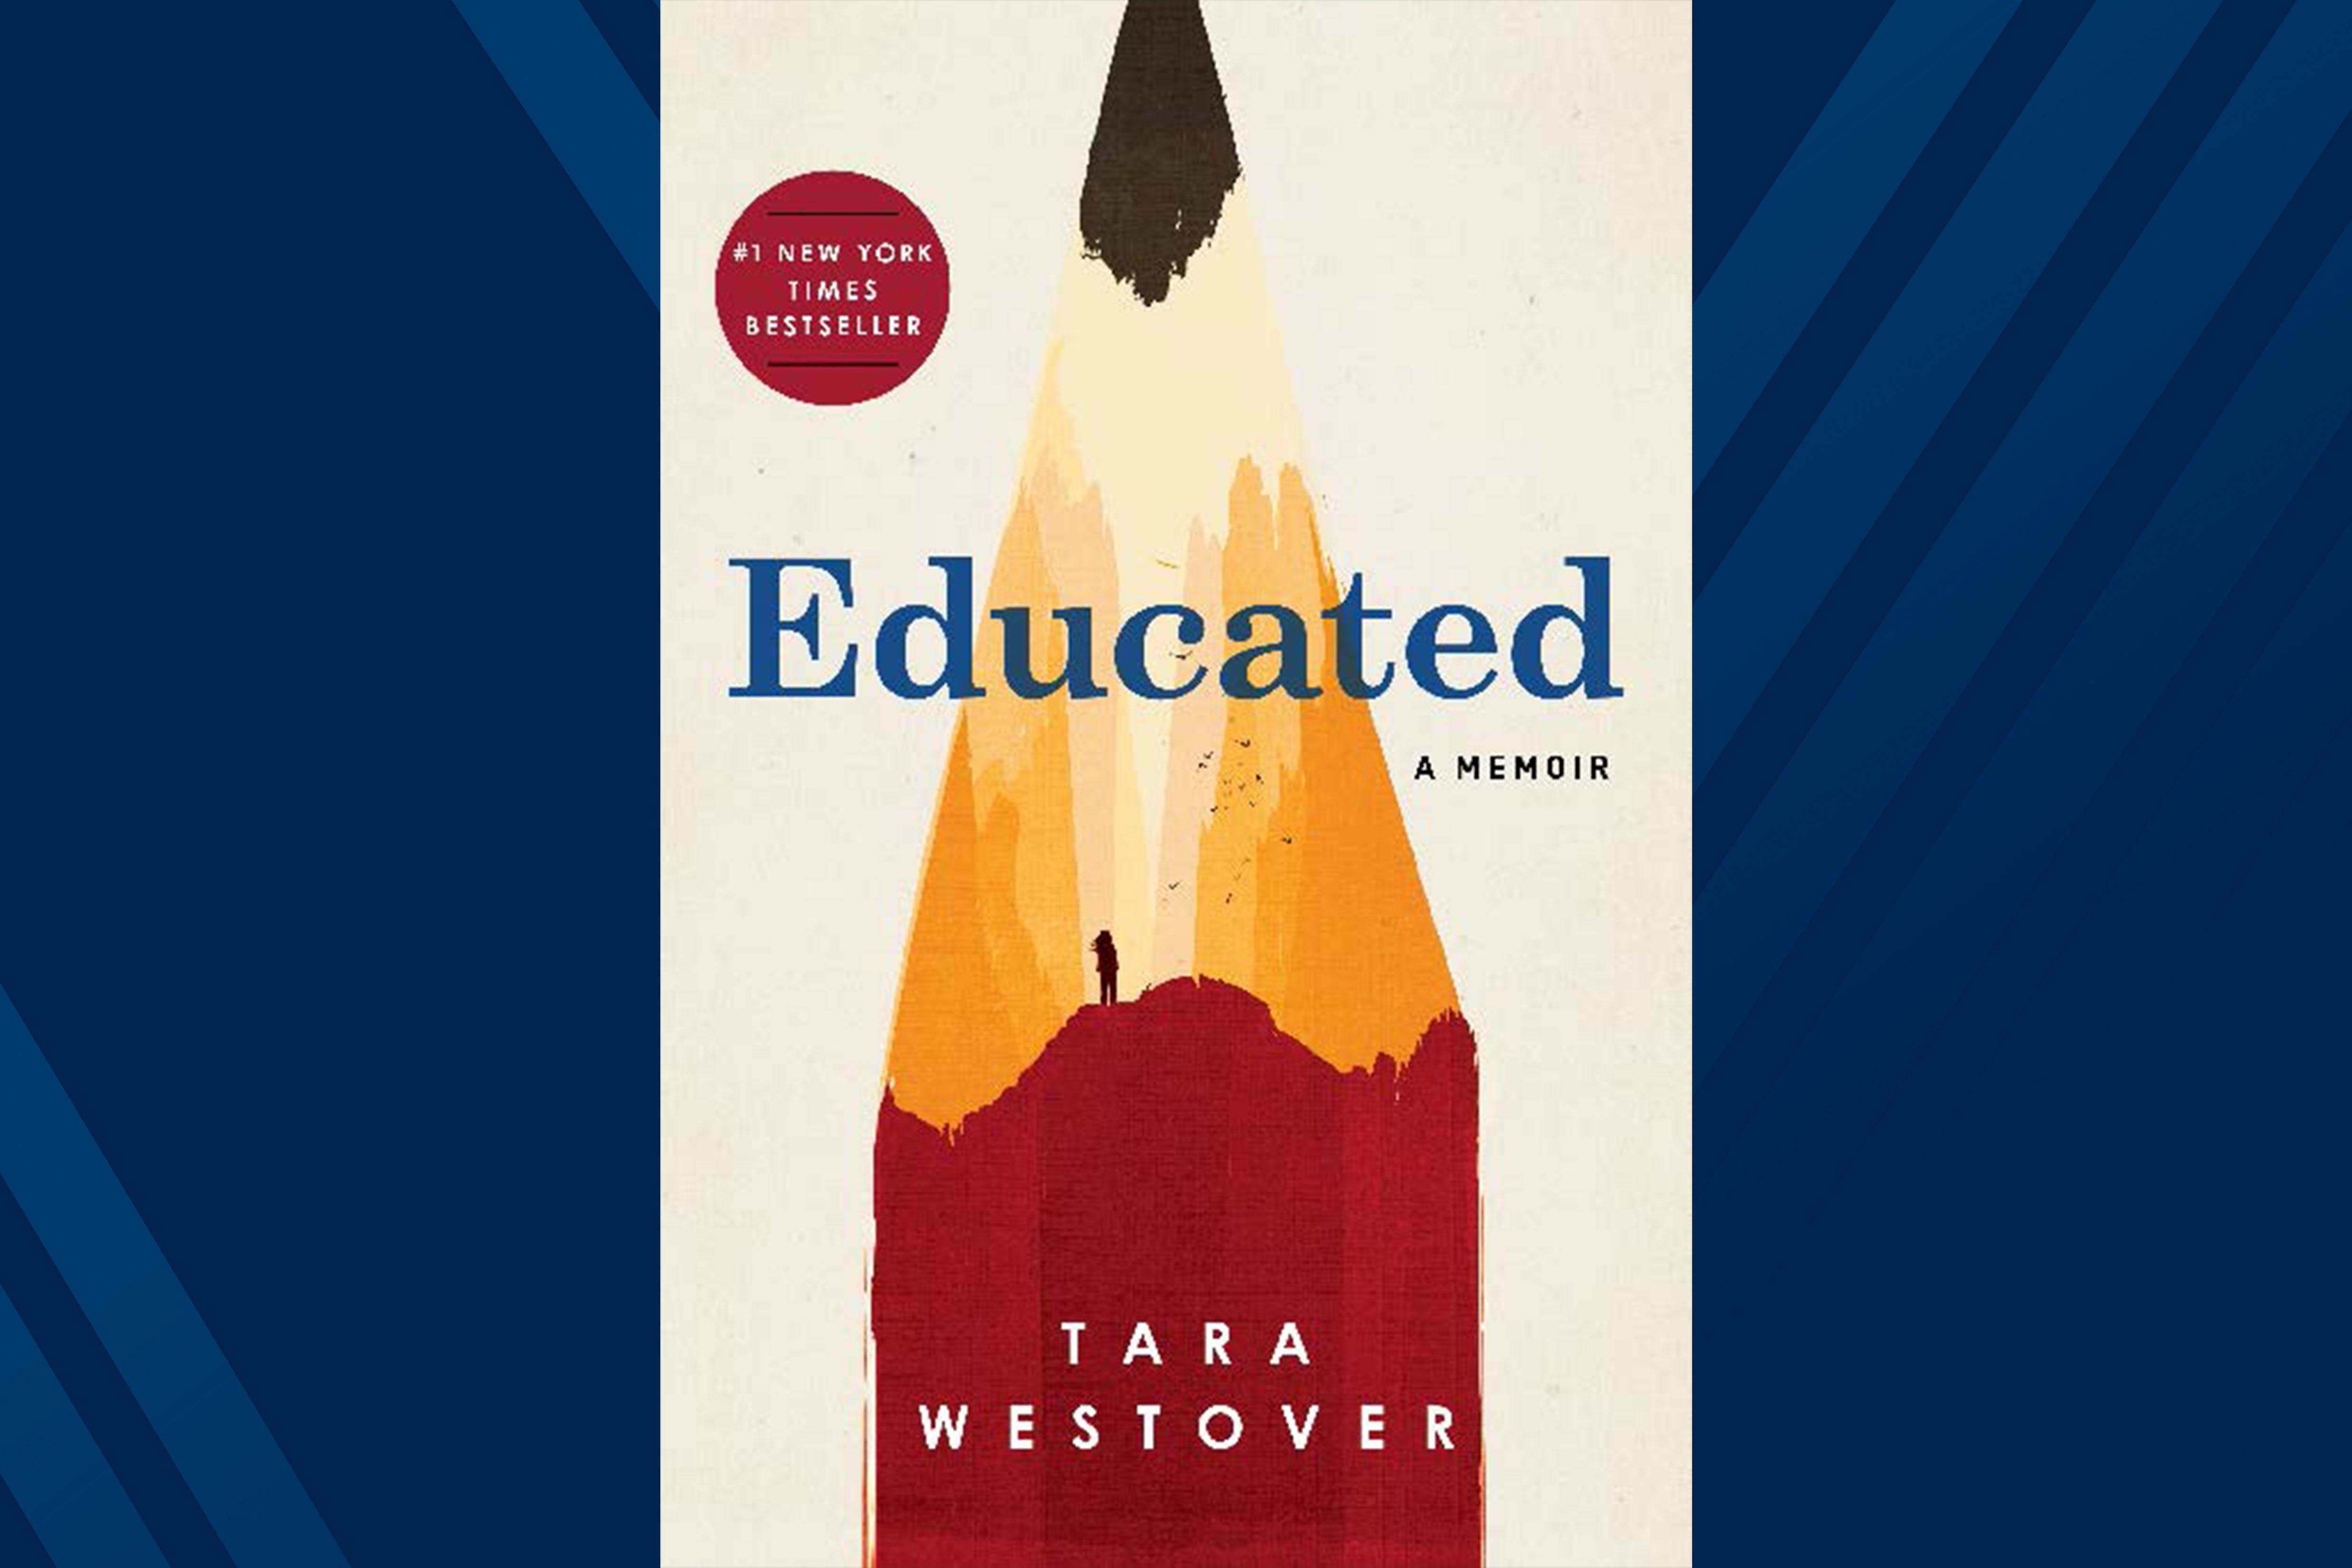 Best Education Books 2020 WVU selects 'Educated: A Memoir' as 2019 20 Campus Read | WVU